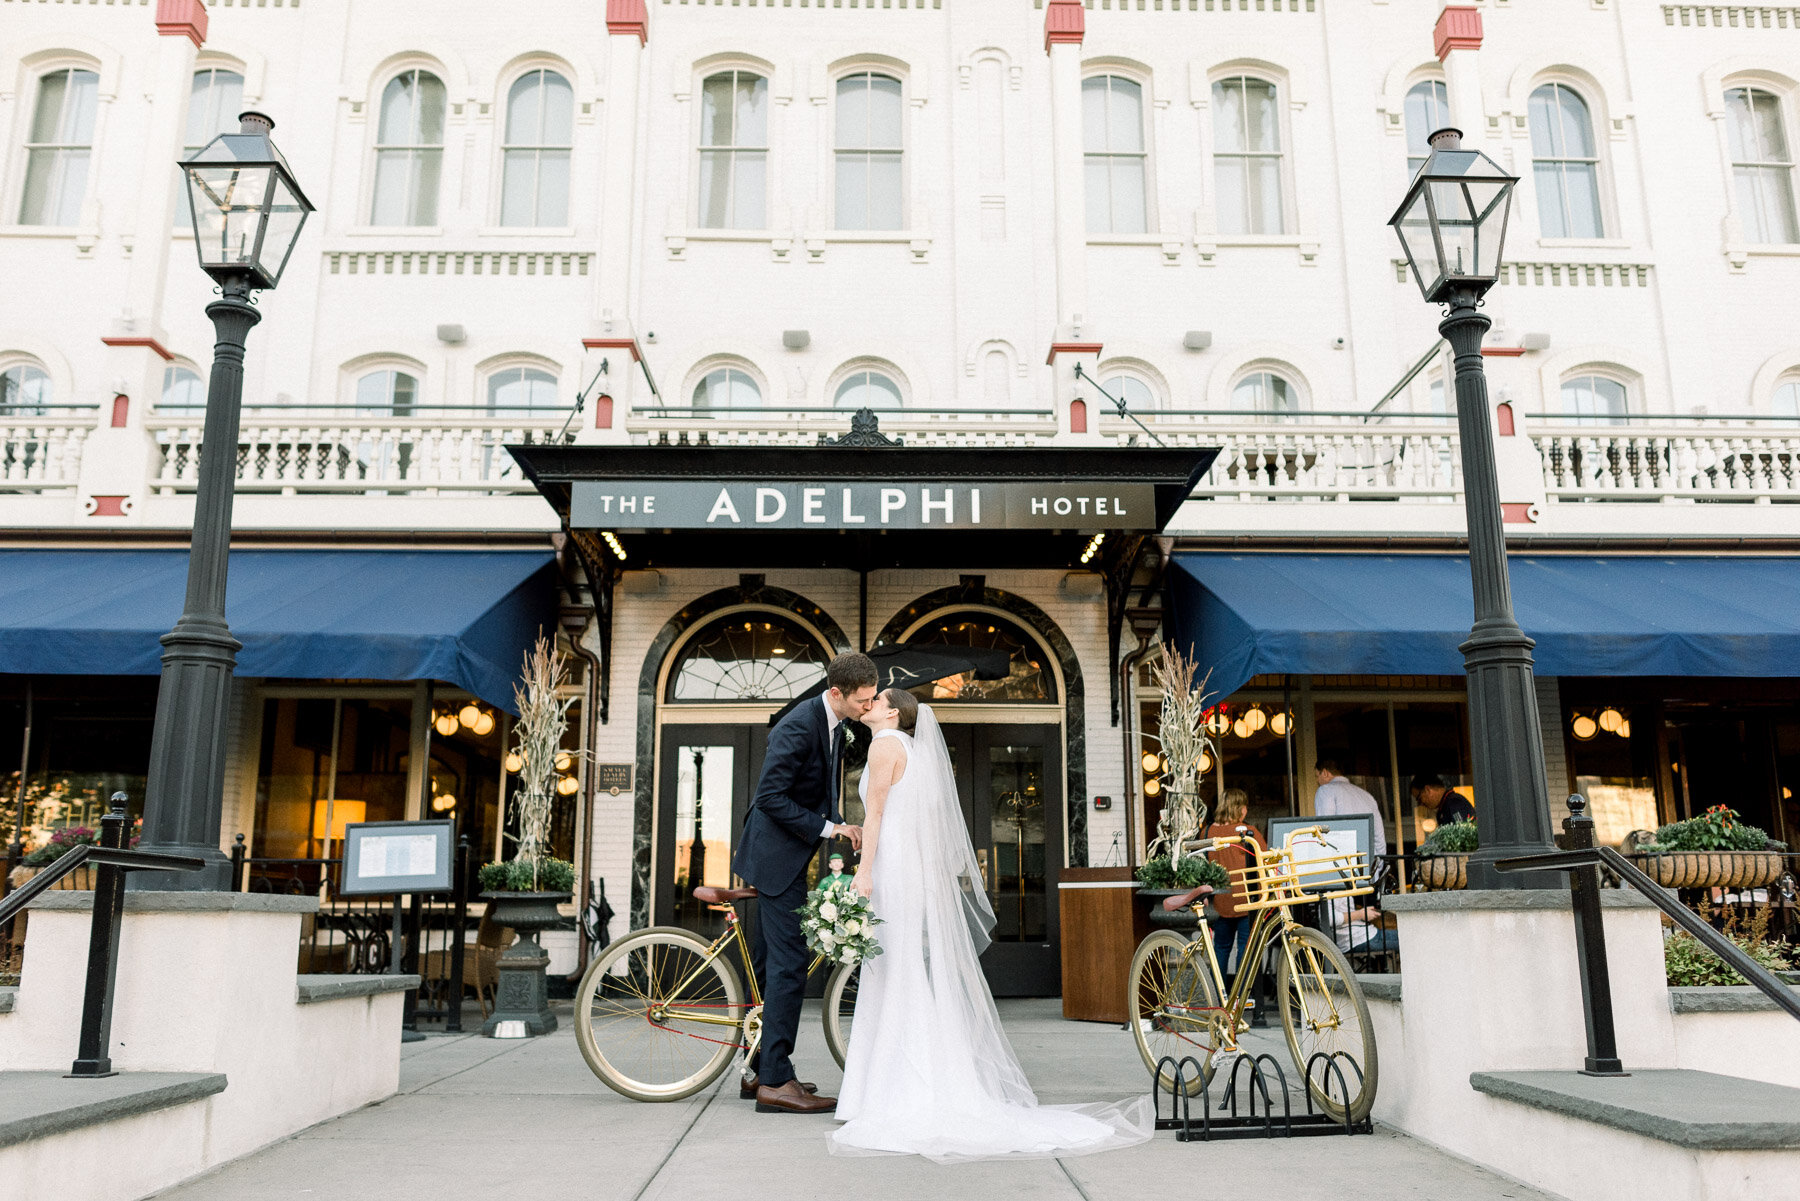 Adelphi Saratoga Wedding by Michelle Lange Photography-28.jpg